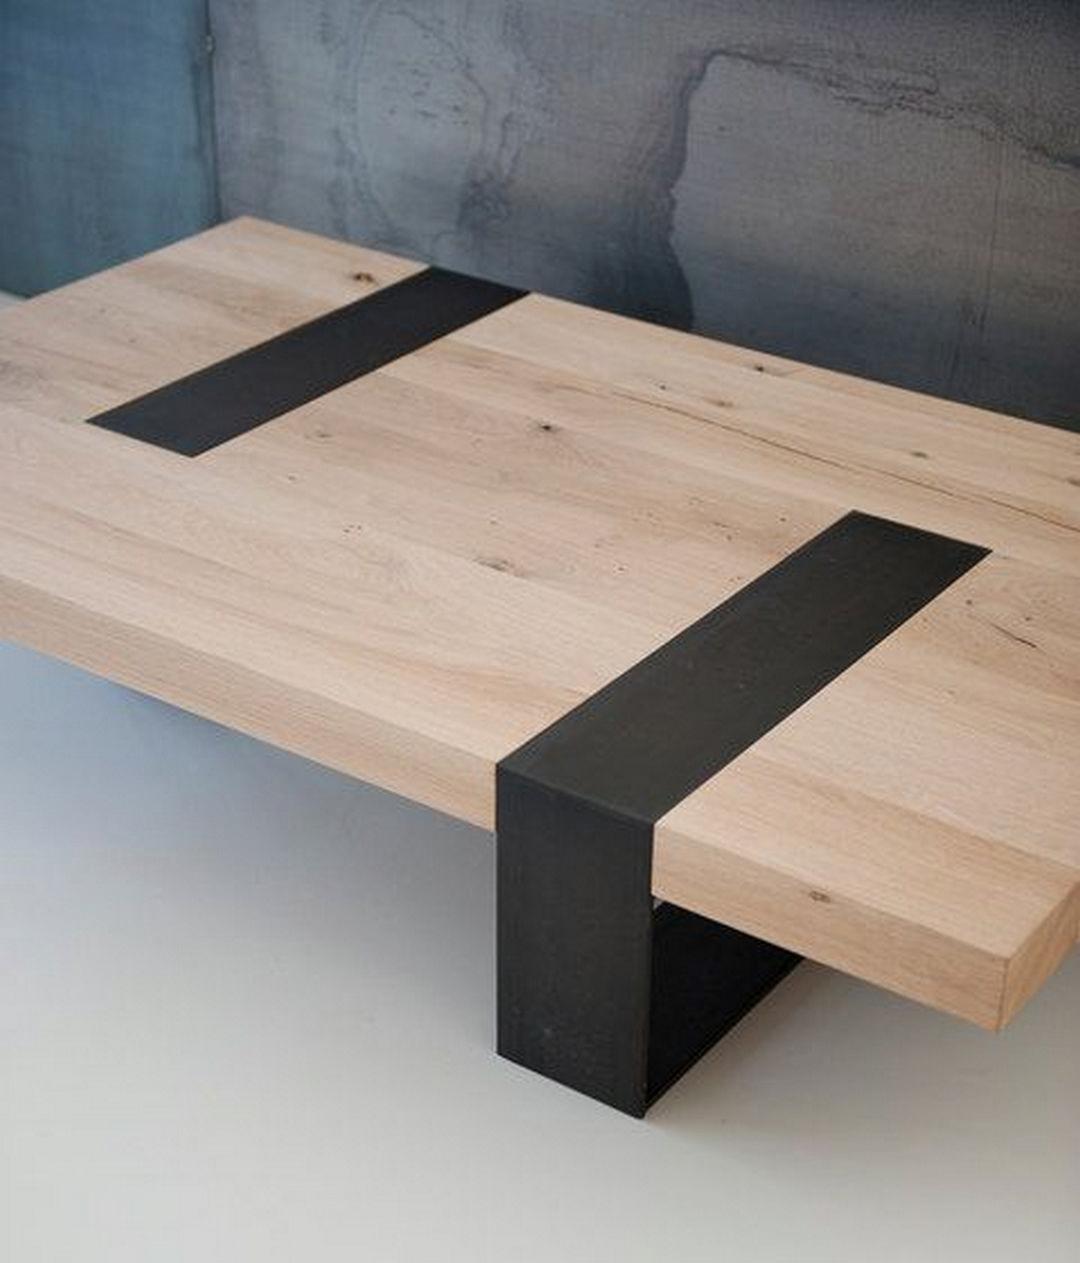 84 wonderful coffee table design ideas furniture design ideas rh pinterest com